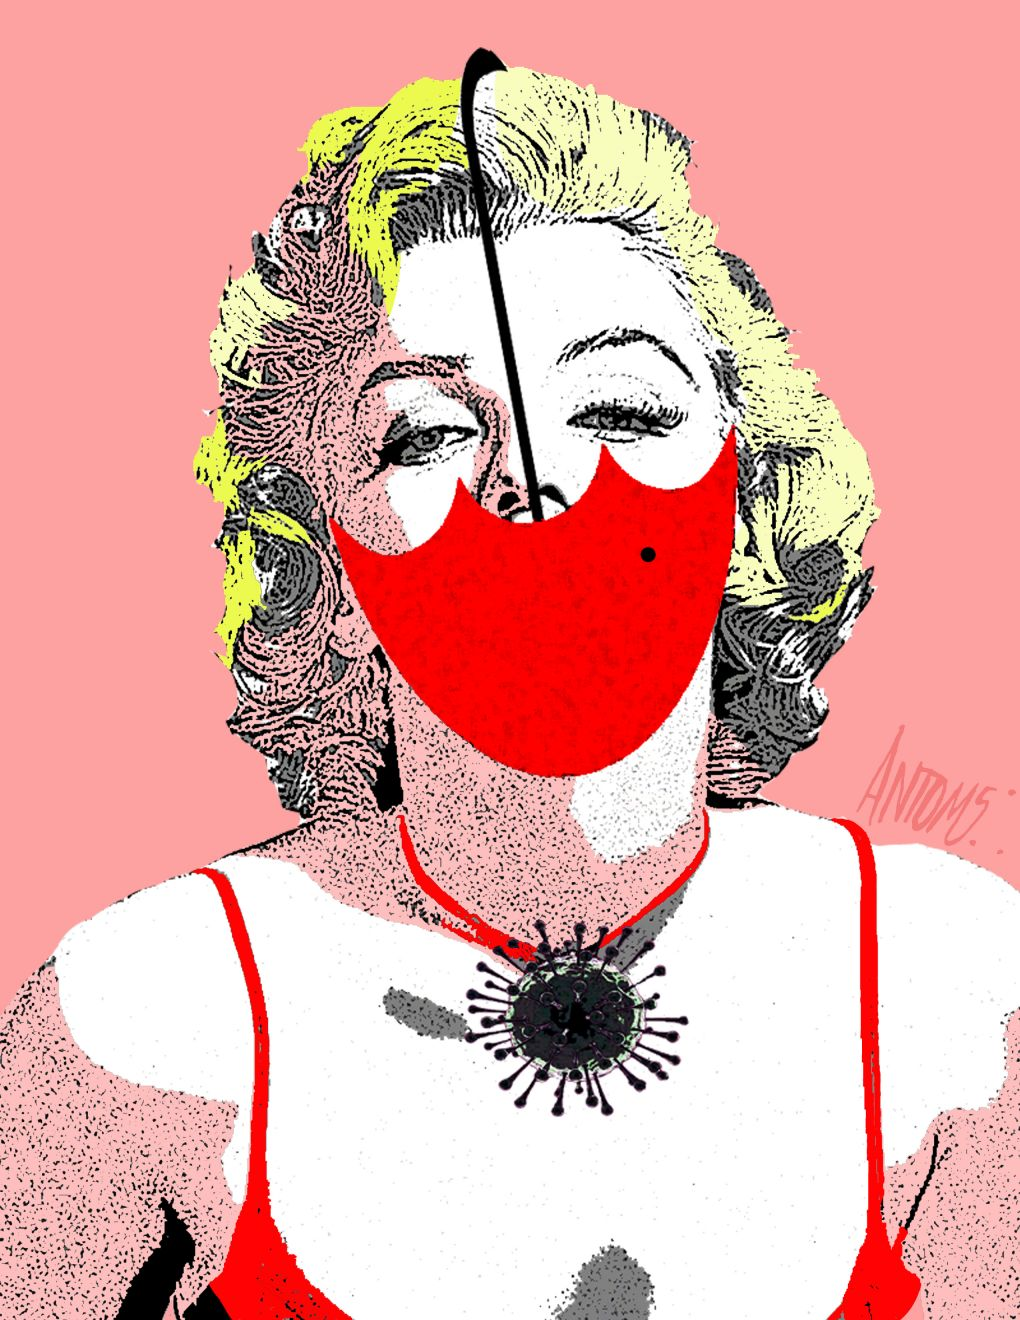 La sombrilla de Mary me protege (2020) - Antonio Medina Segura - ANTOMS